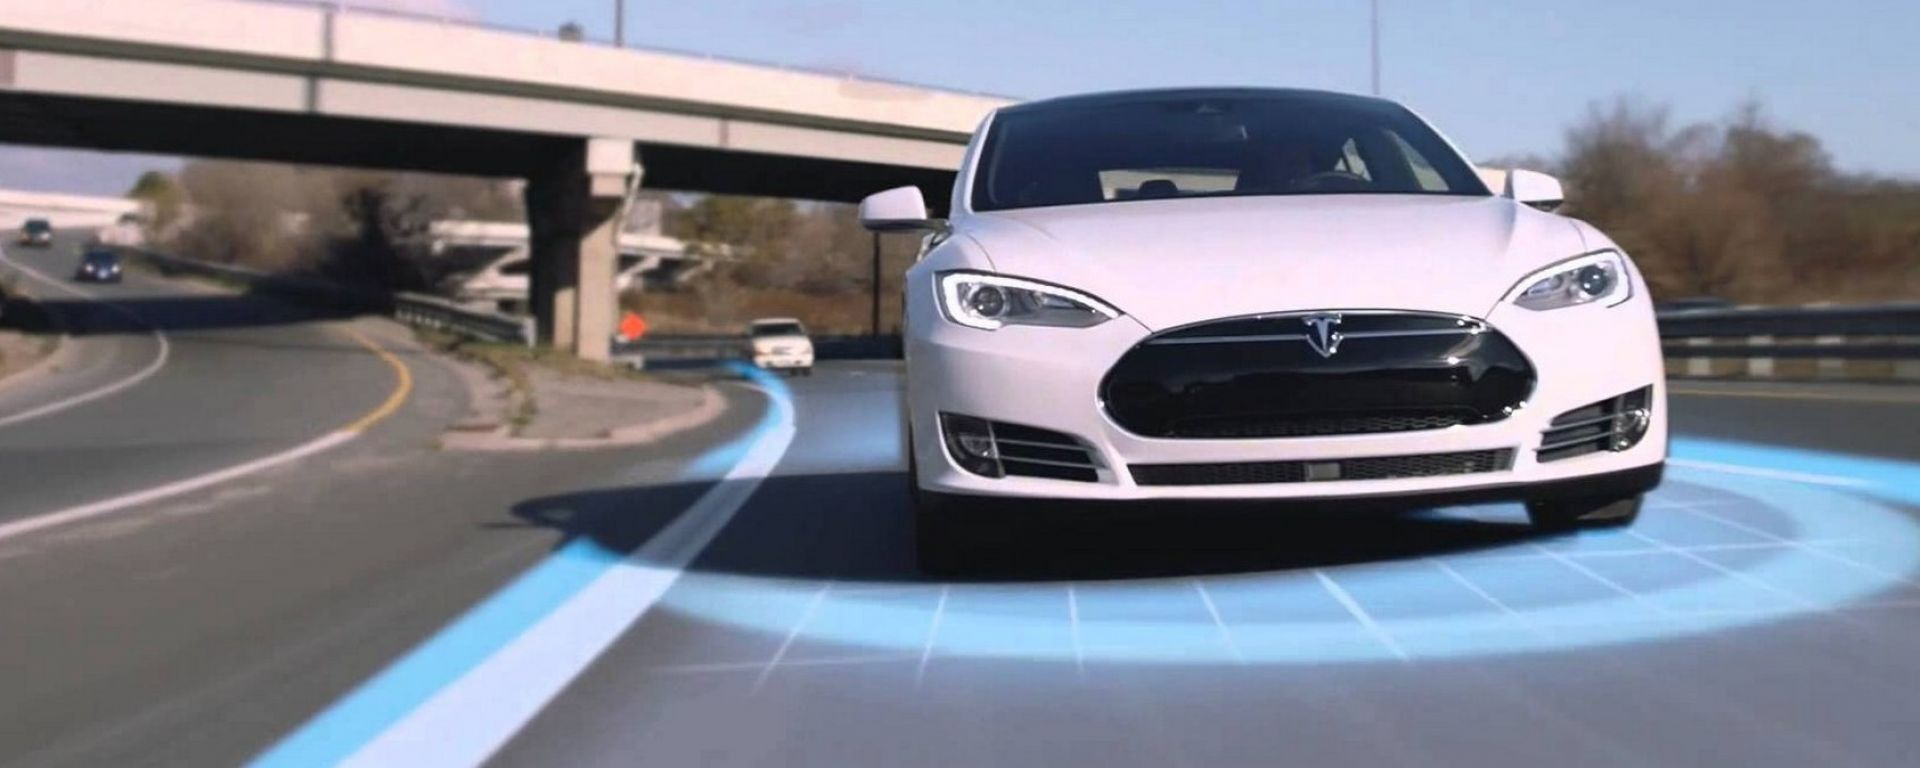 Tesla Navigate on Autopilot, per Model 3 un'altra funzione di assistenza alla guida